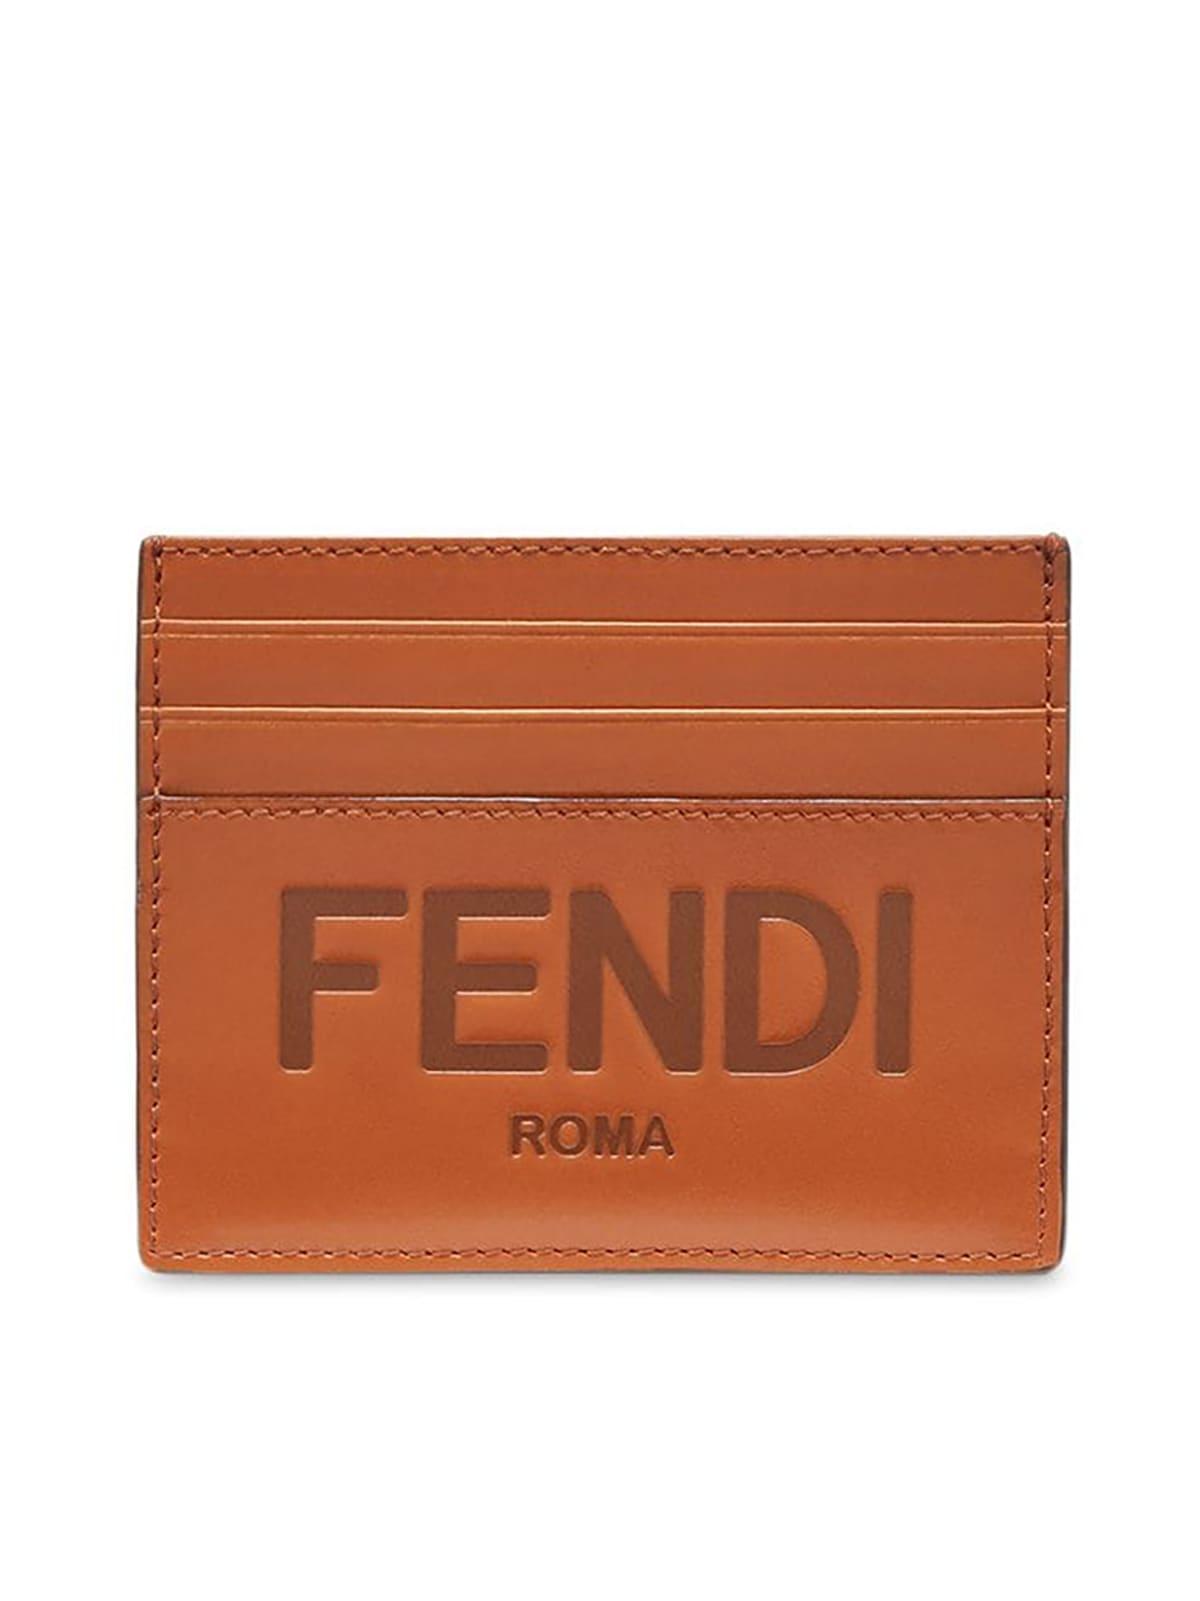 Fendi Businnes Card H Vit. king